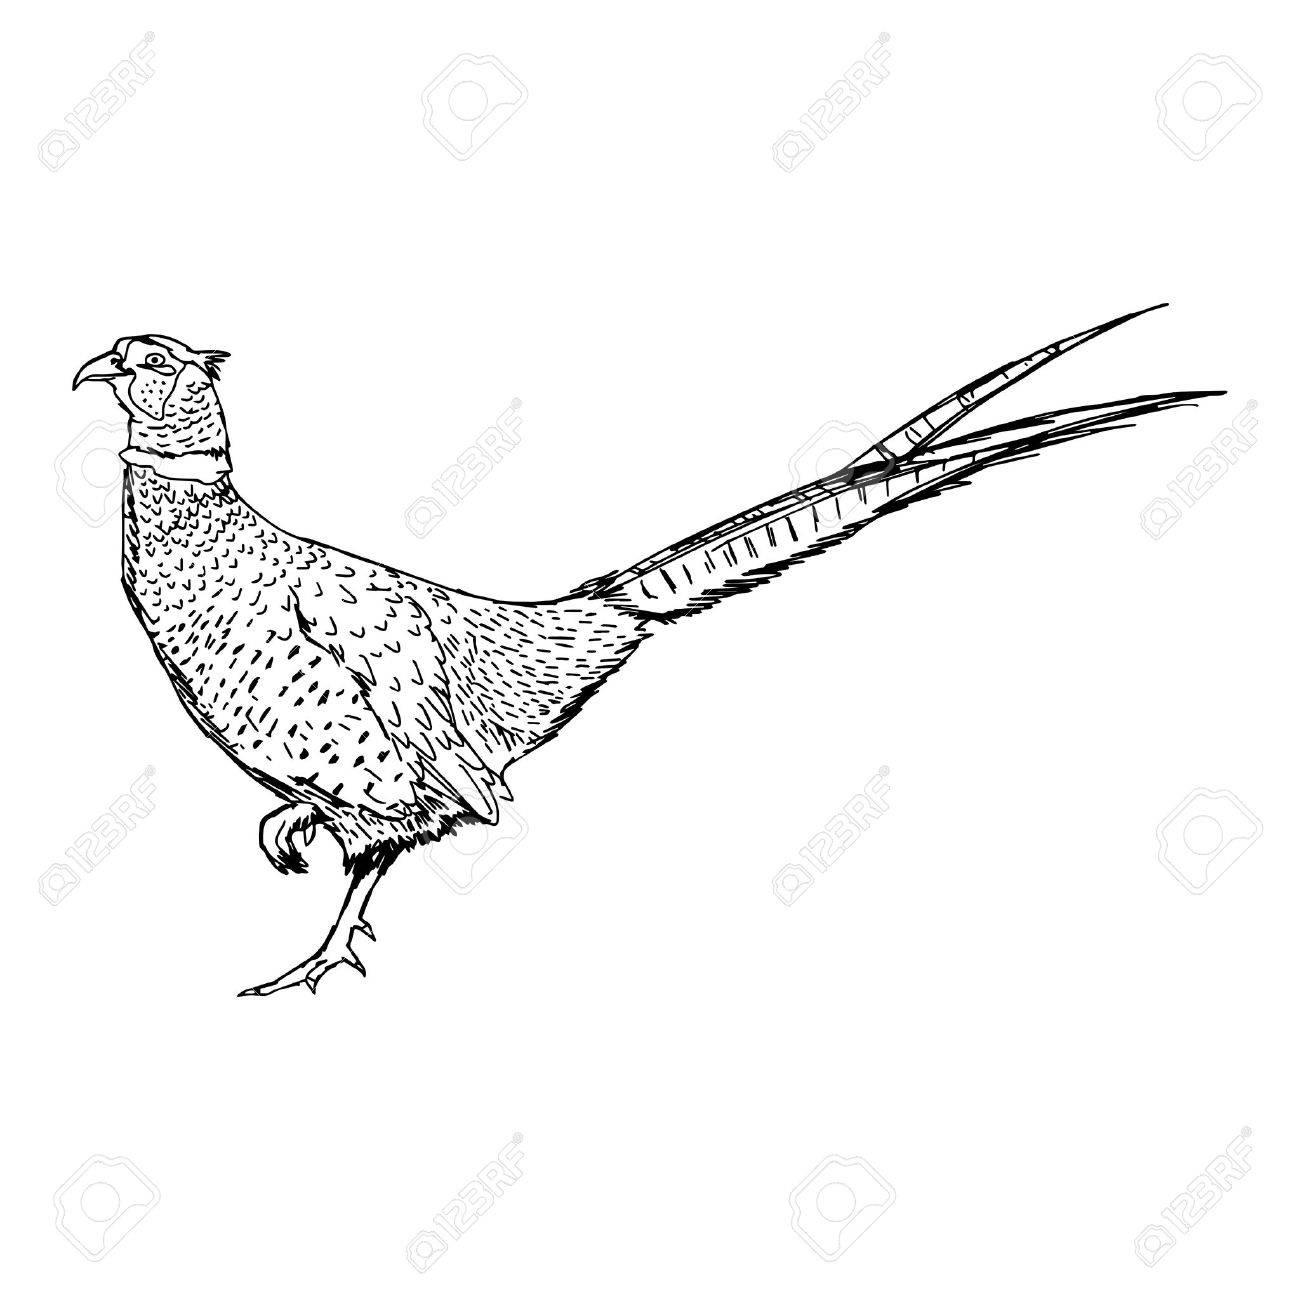 1300x1300 Illustration Doodle Of Sketch Common Pheasant (Phasianus